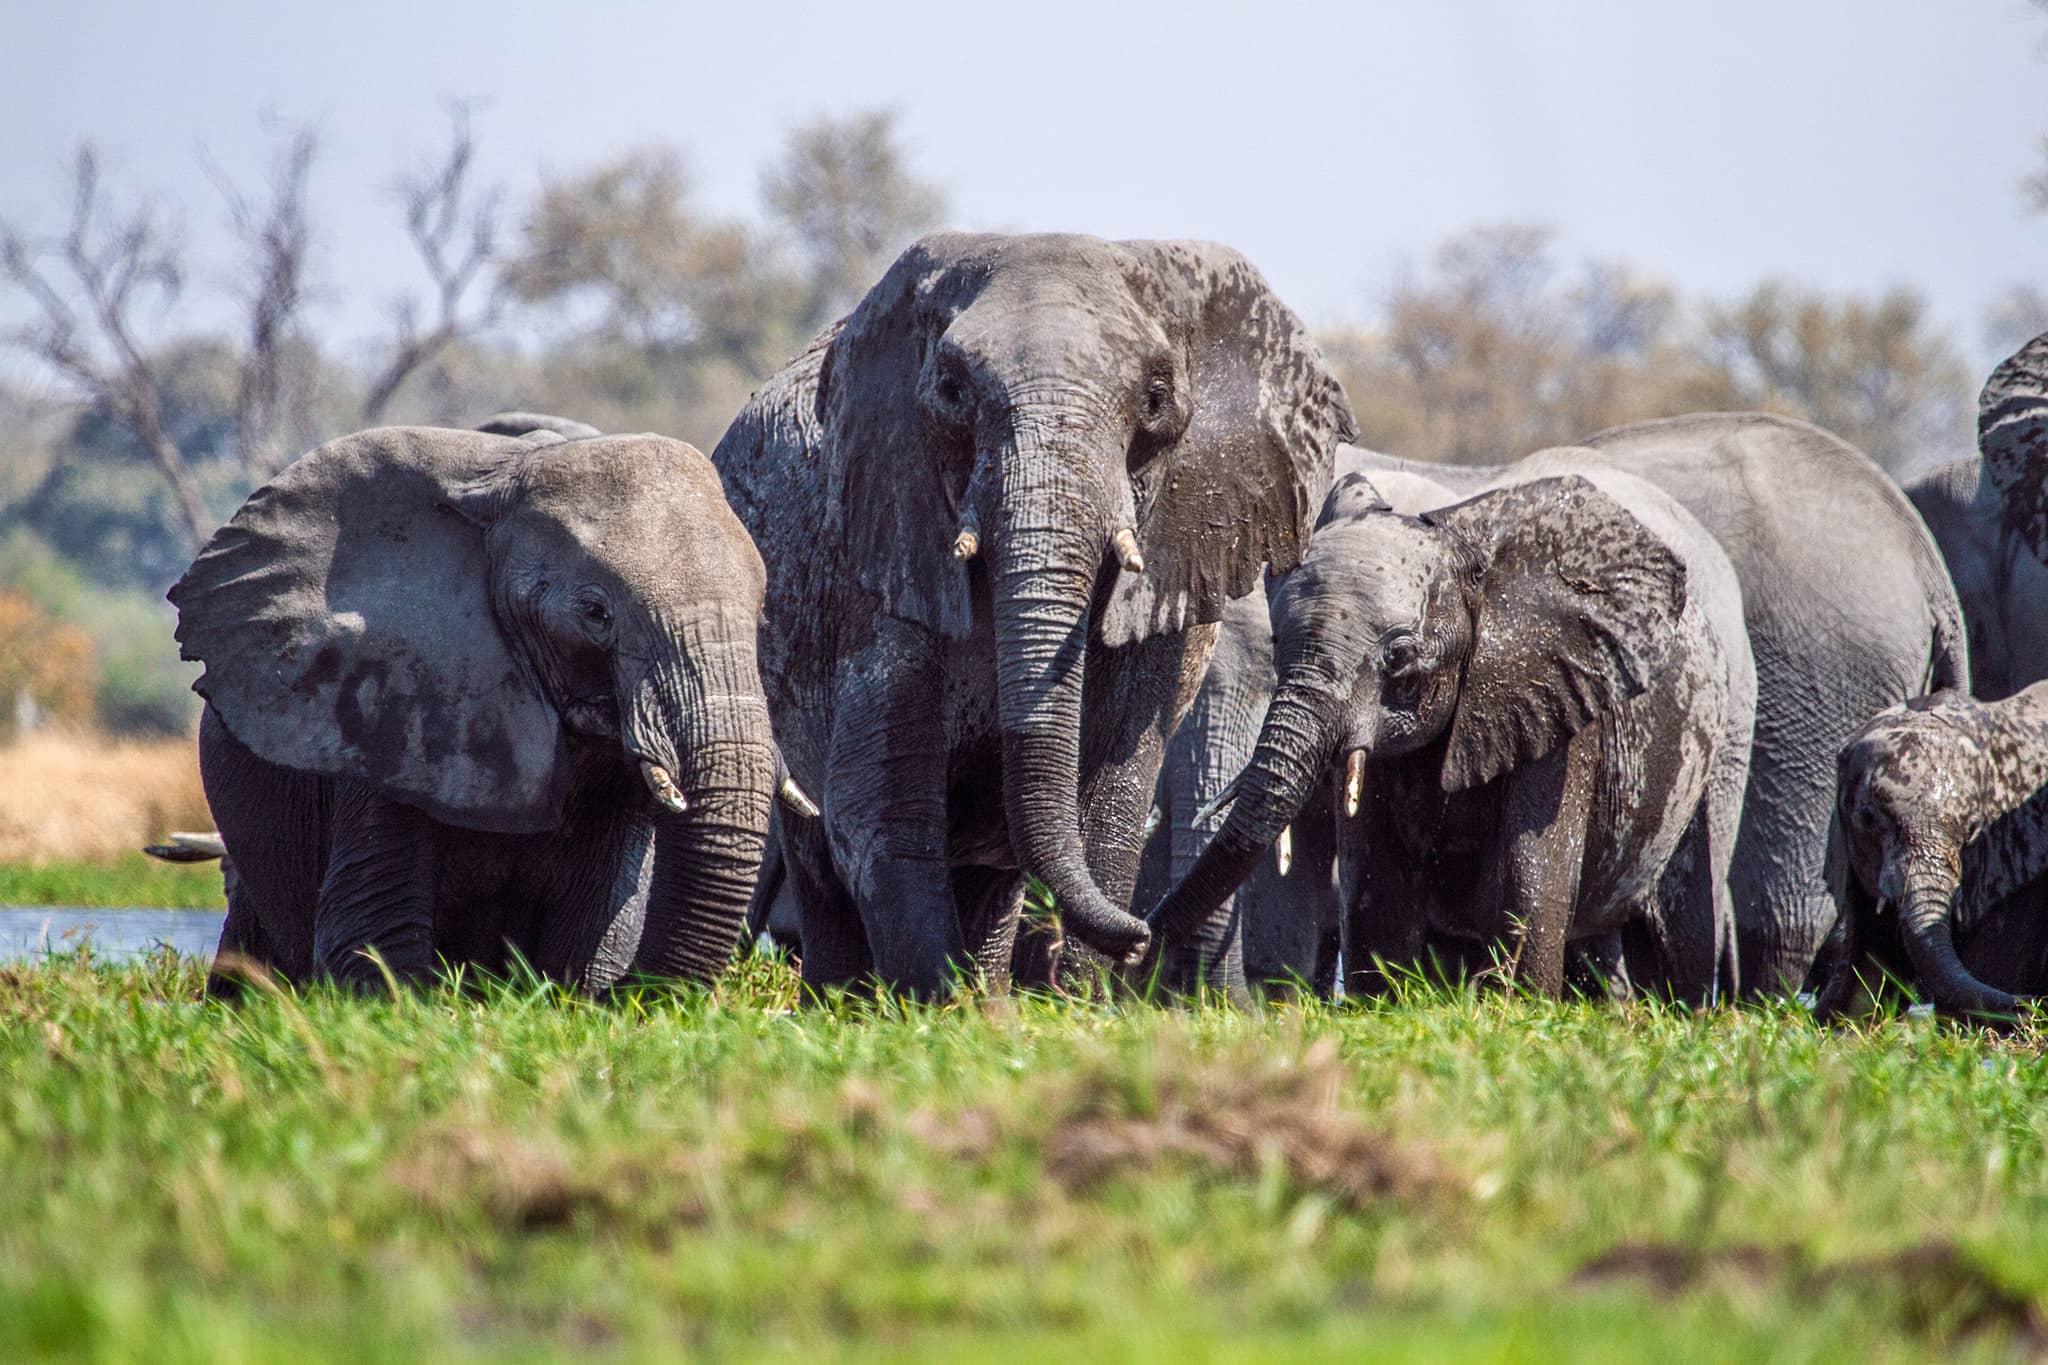 Muddy elephants in Machaba Camp Botswana Khwai Concession